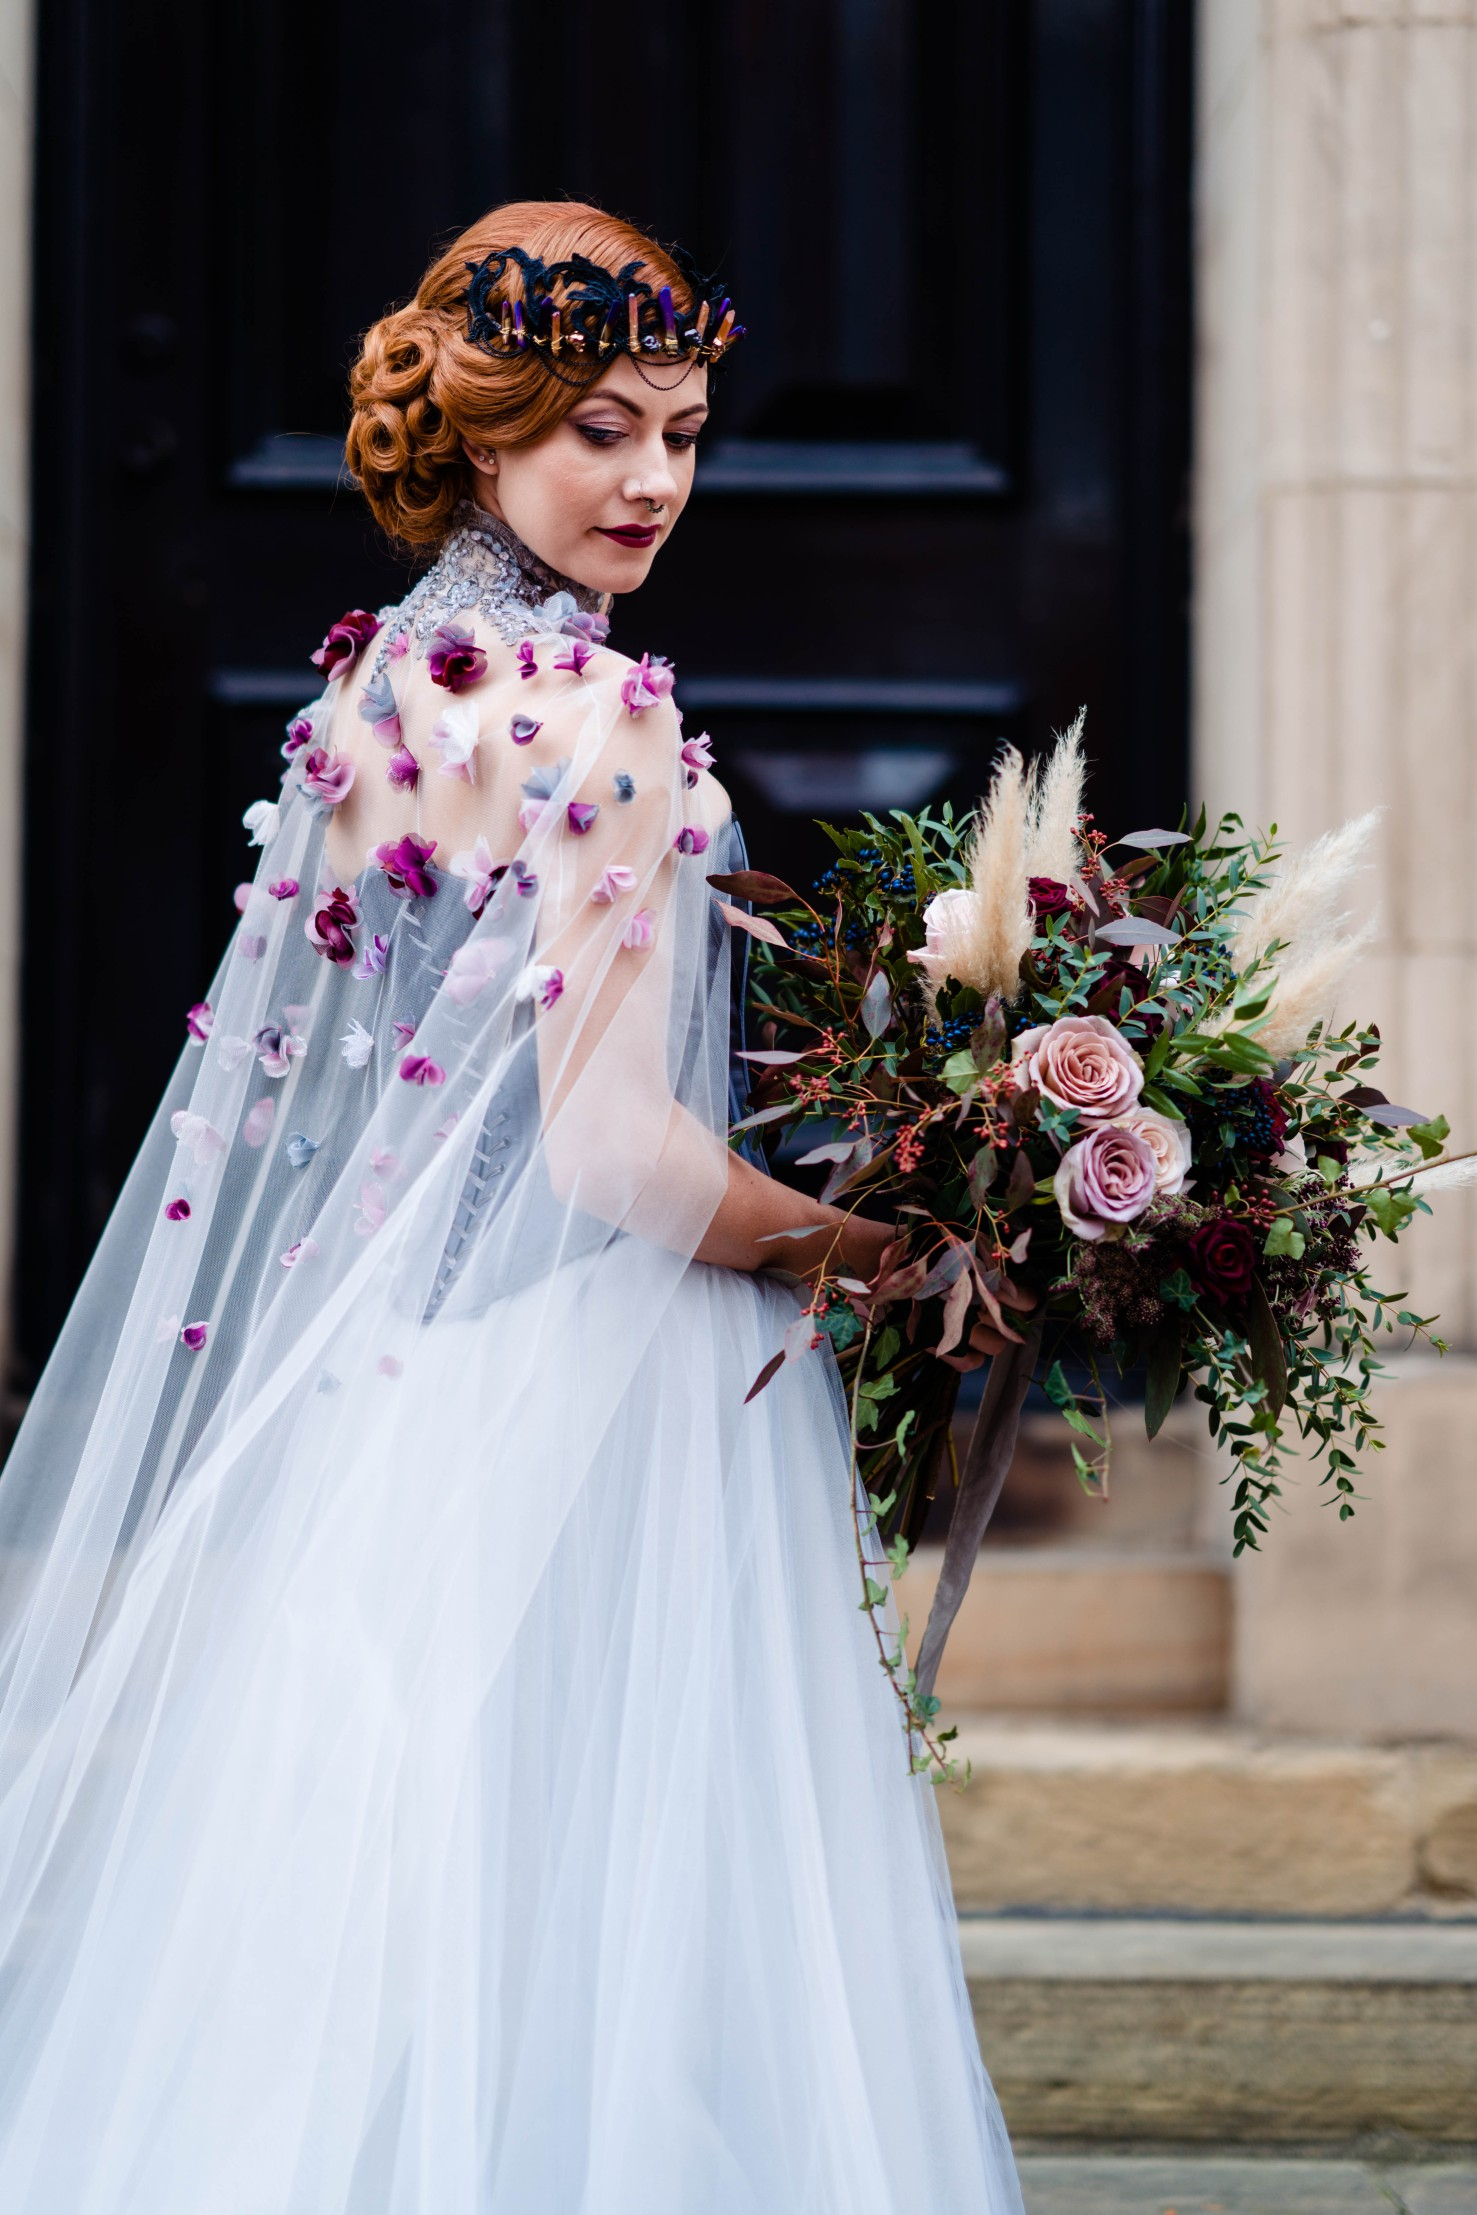 Vicki Clayson Photography - Dress Fiona Elizabeth Couture - Head piece Dolls Mad Hattery - Game of thrones wedding - alternative wedding 2